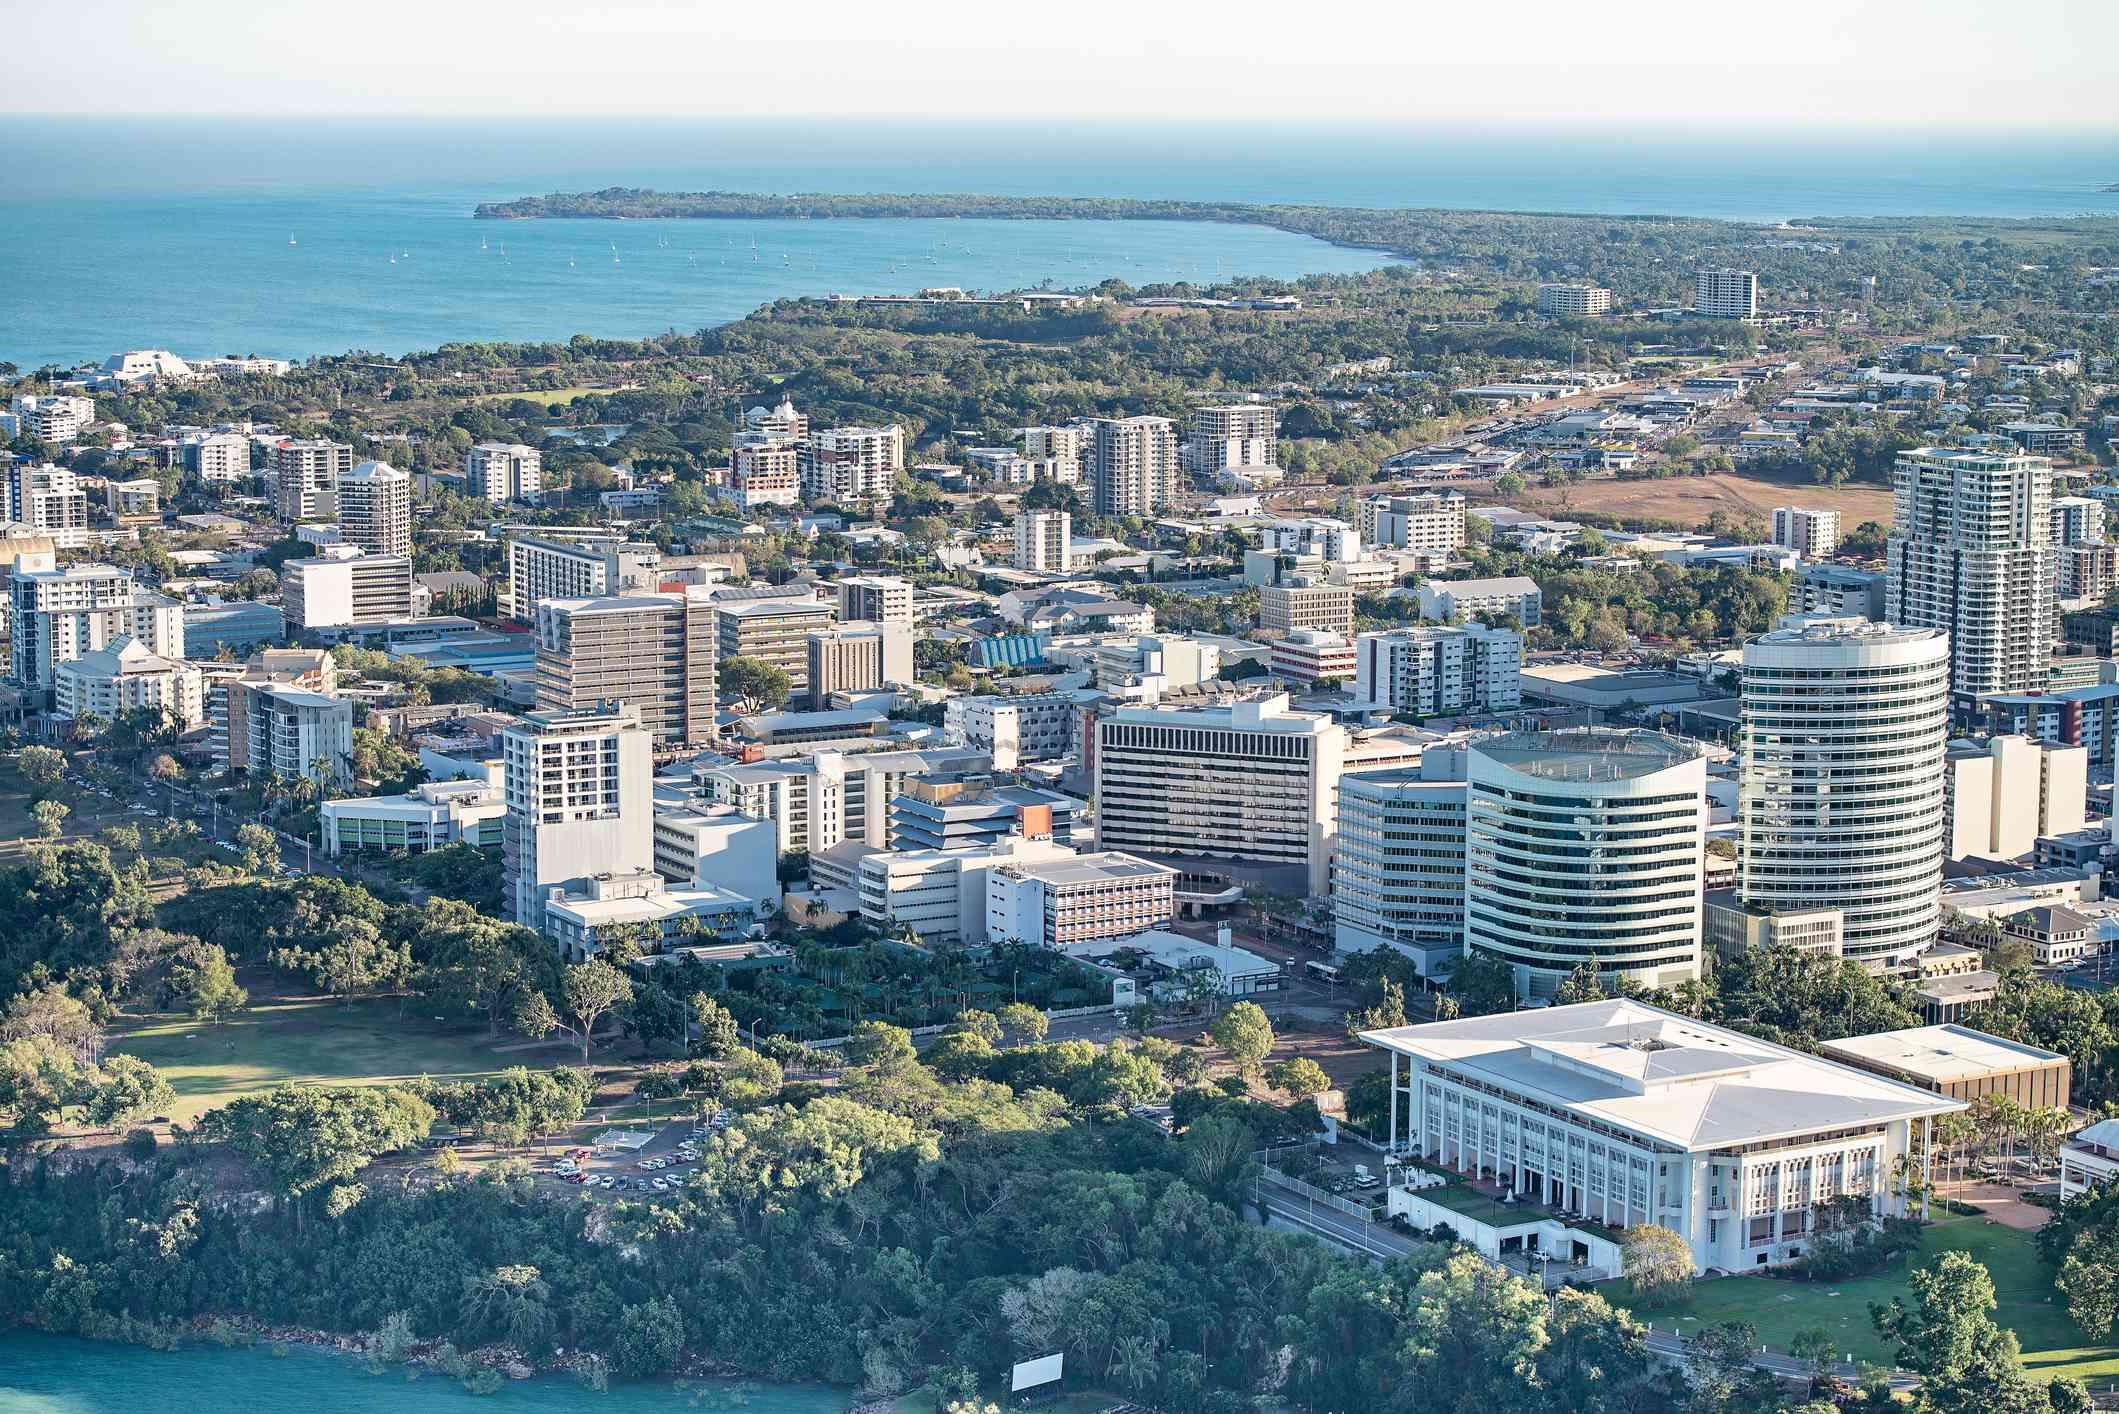 Aerial shot of Darwin and coastline